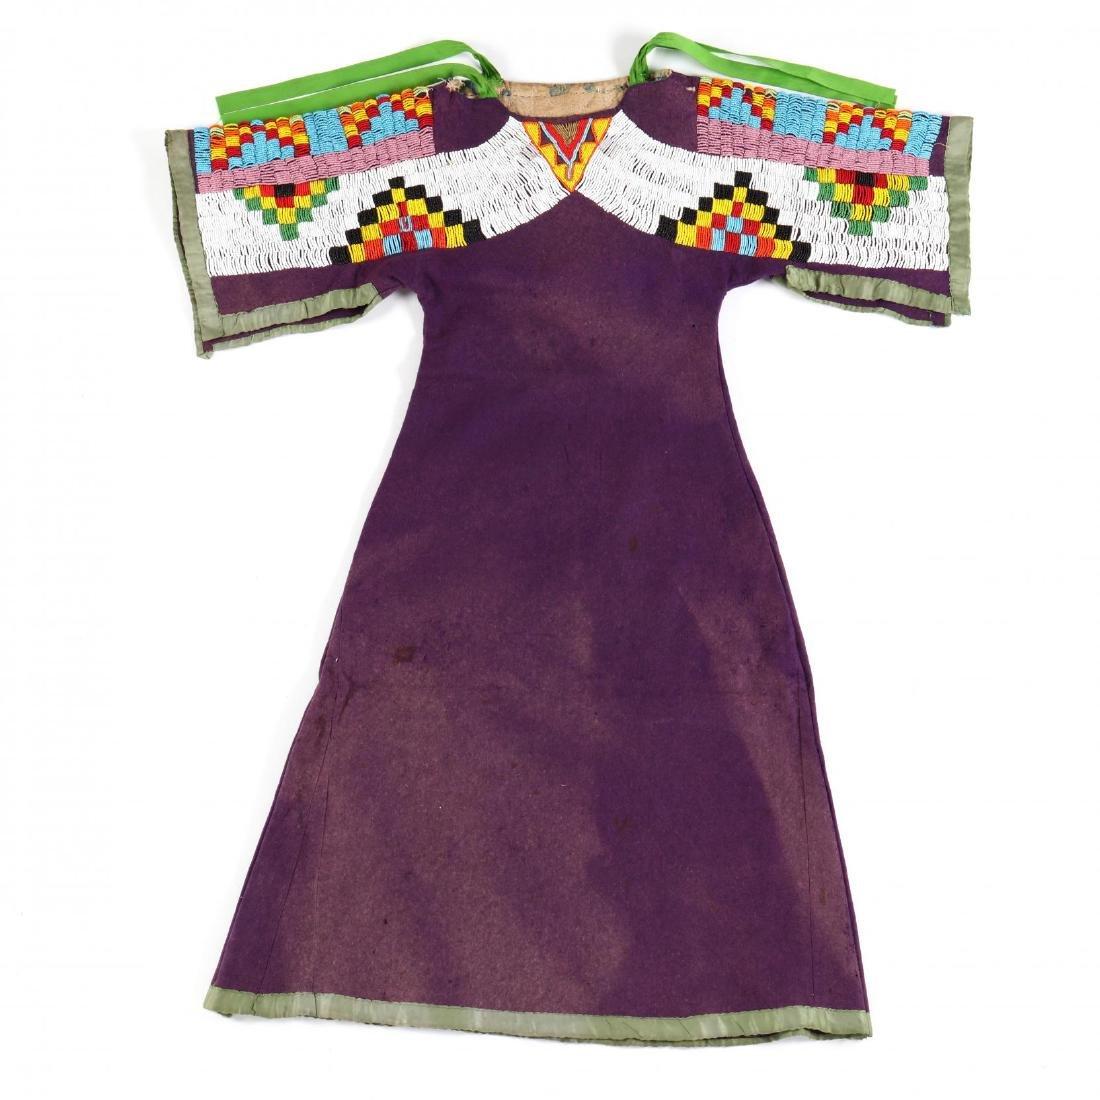 Nez Perce, Woman's Beaded Dress